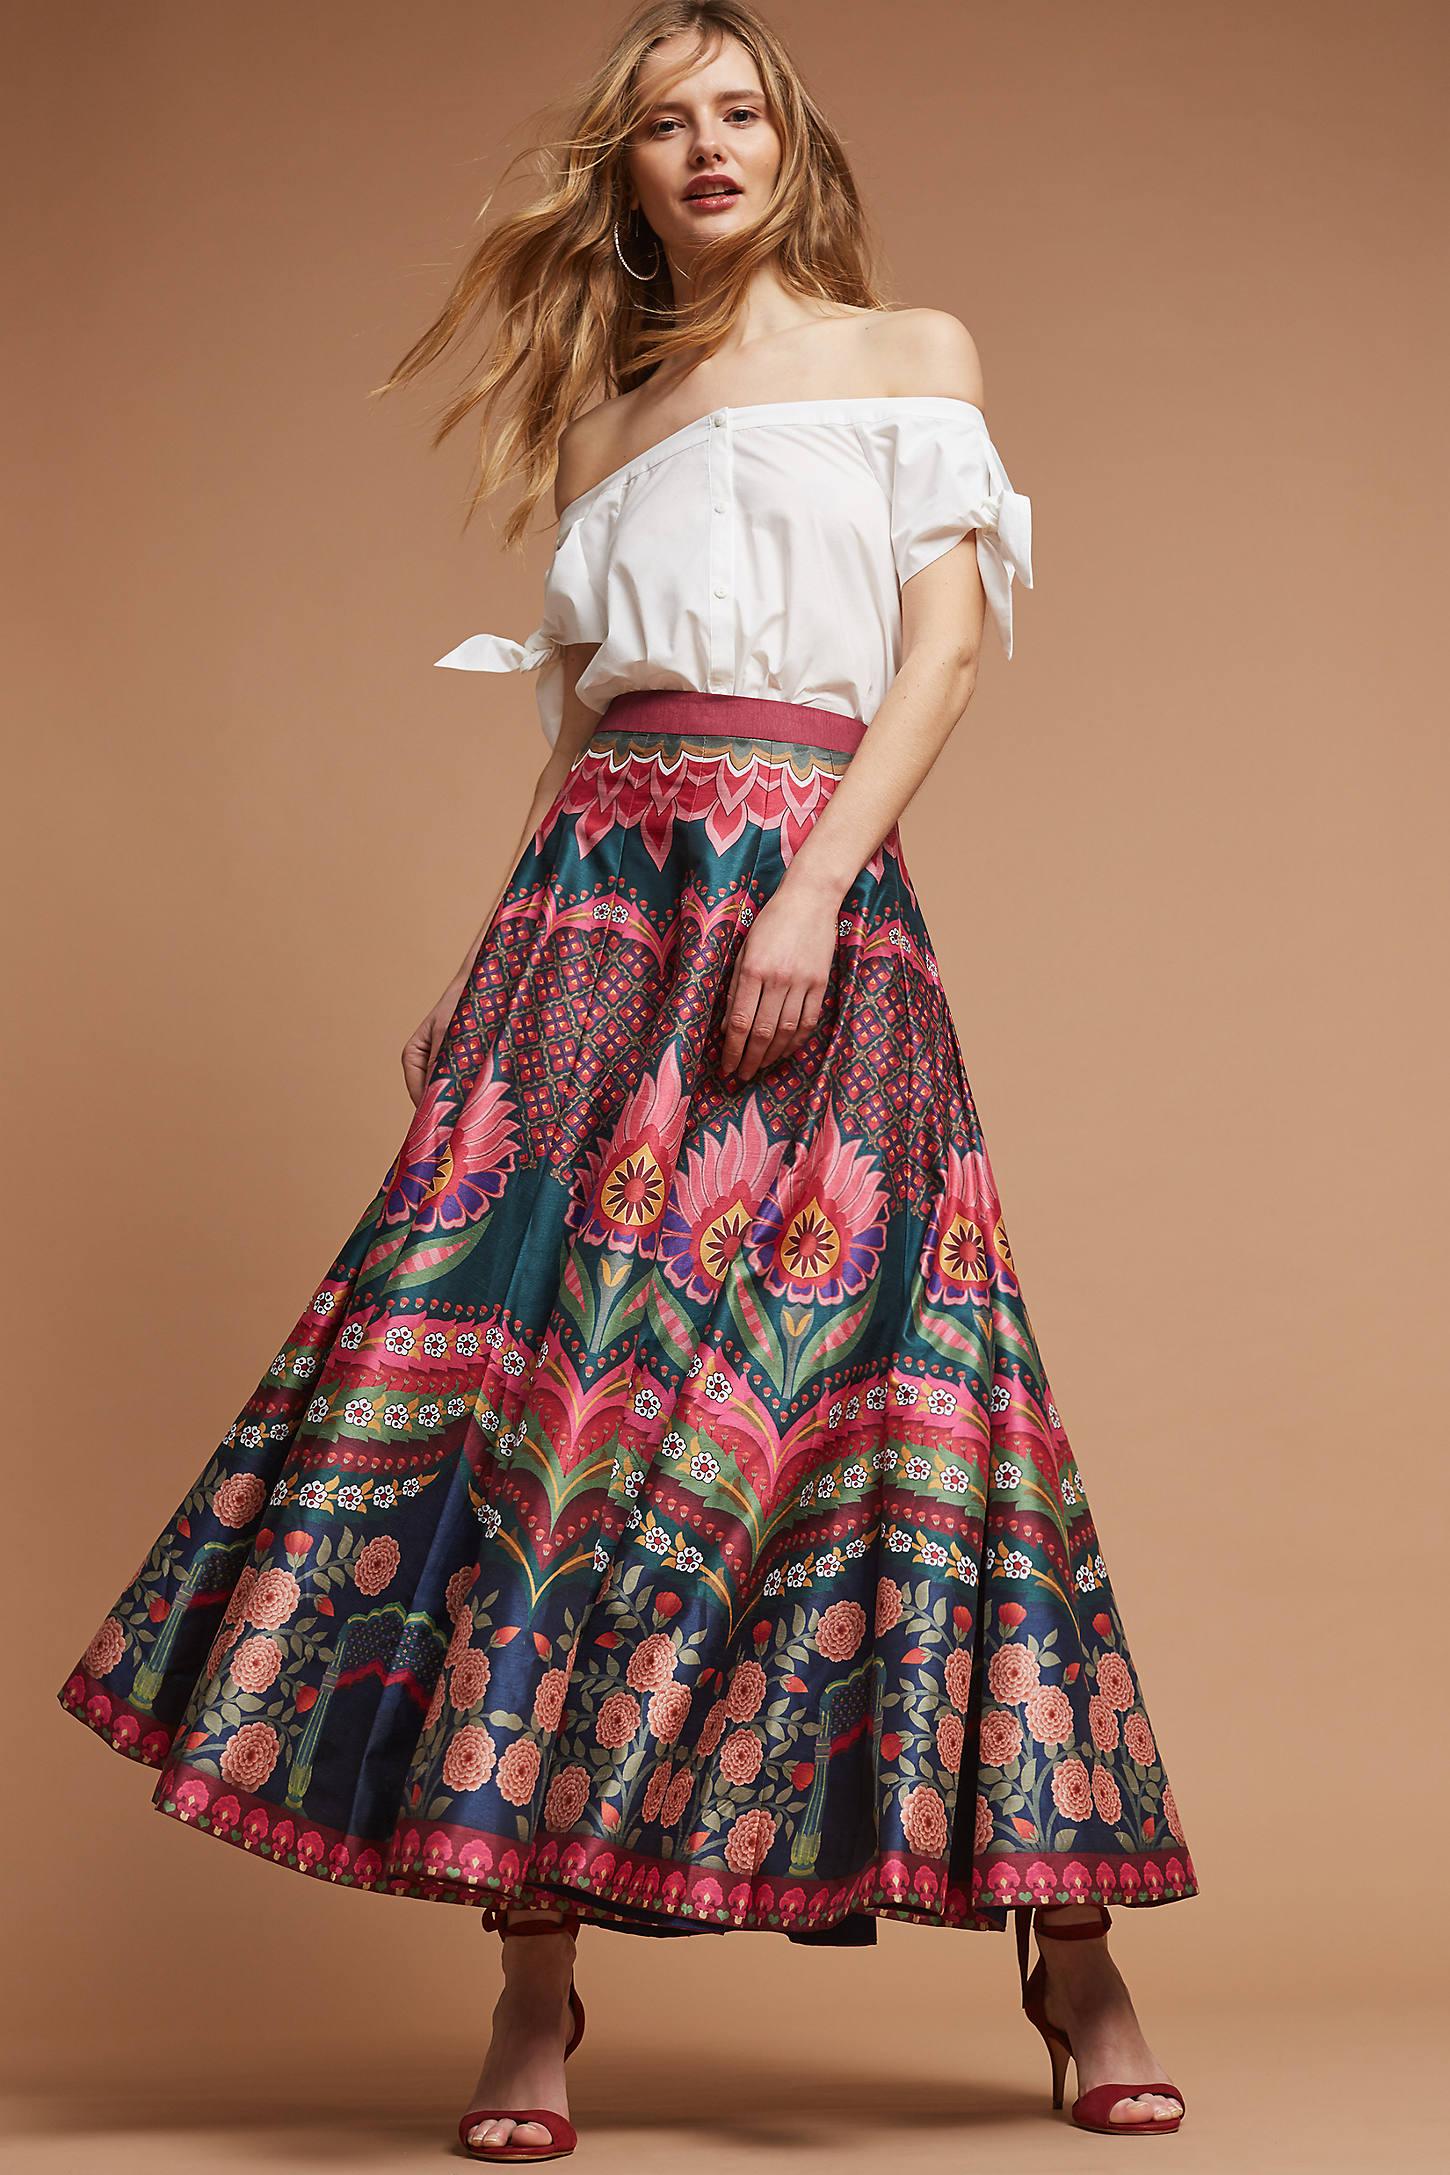 Austrella Maxi Skirt